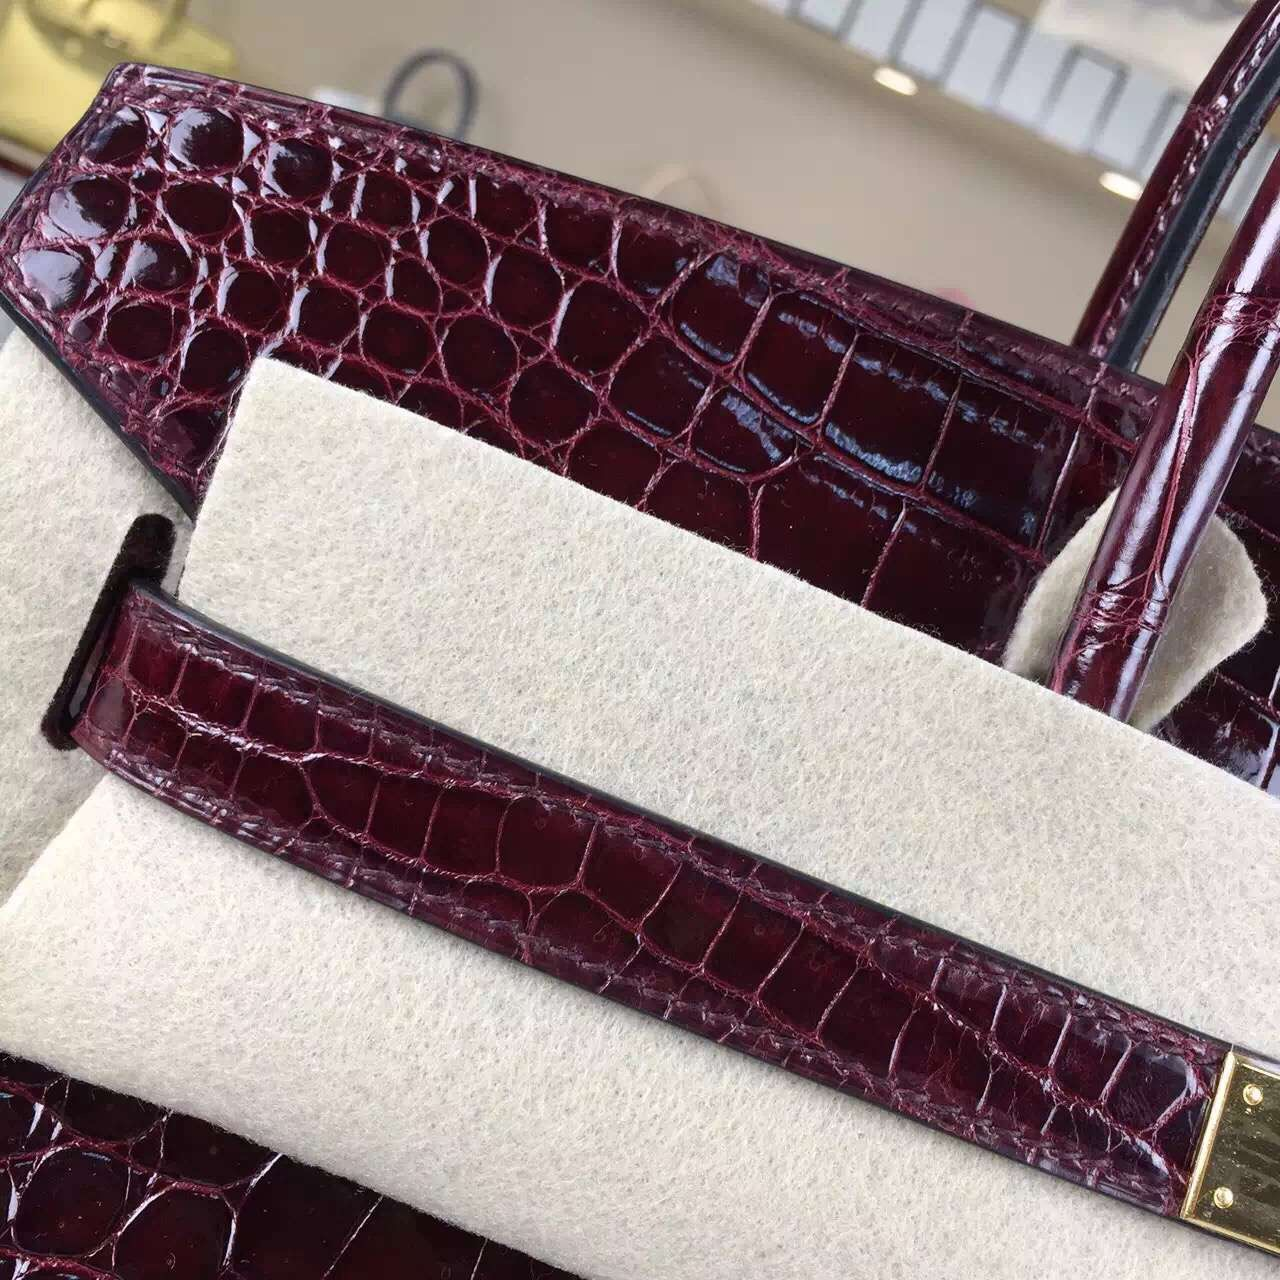 Online Shopping Hermes Birkin Bag35CM Crocodile Shiny Leather CK57 Bordeaux Red